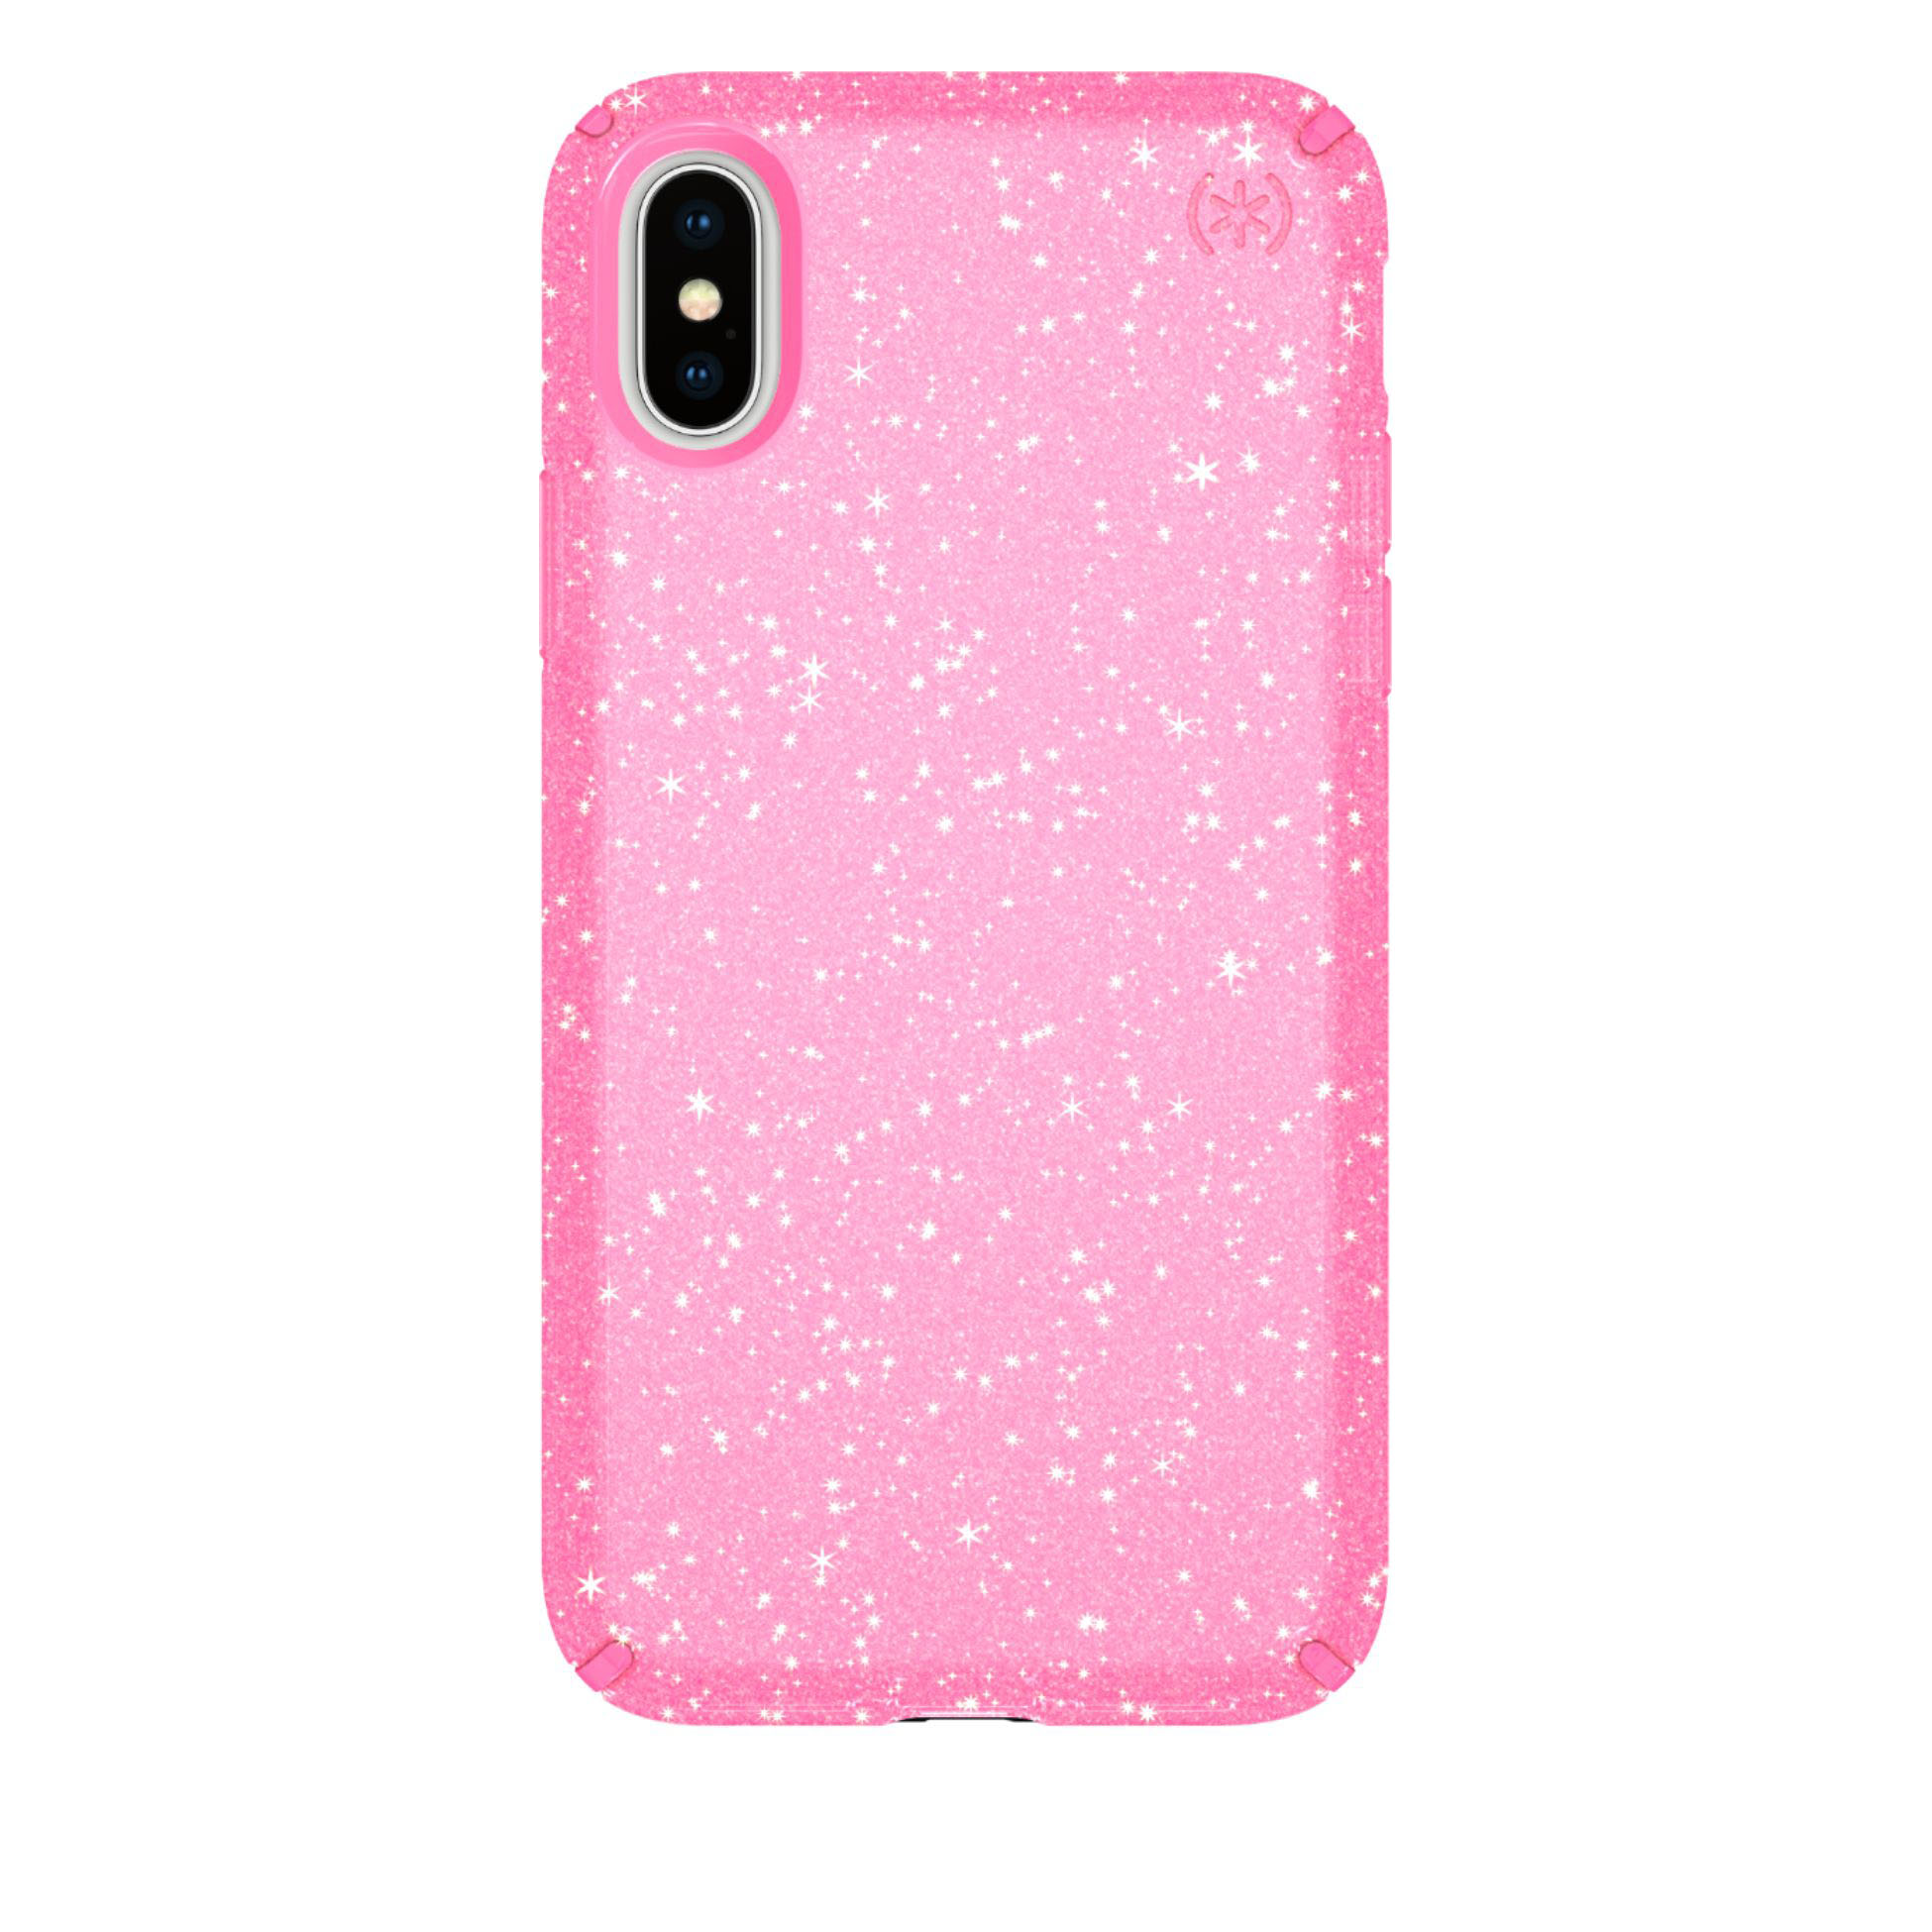 Speck Presidio Glitter Case for Apple iPhone X/XS - Clear/glitter/bella pink